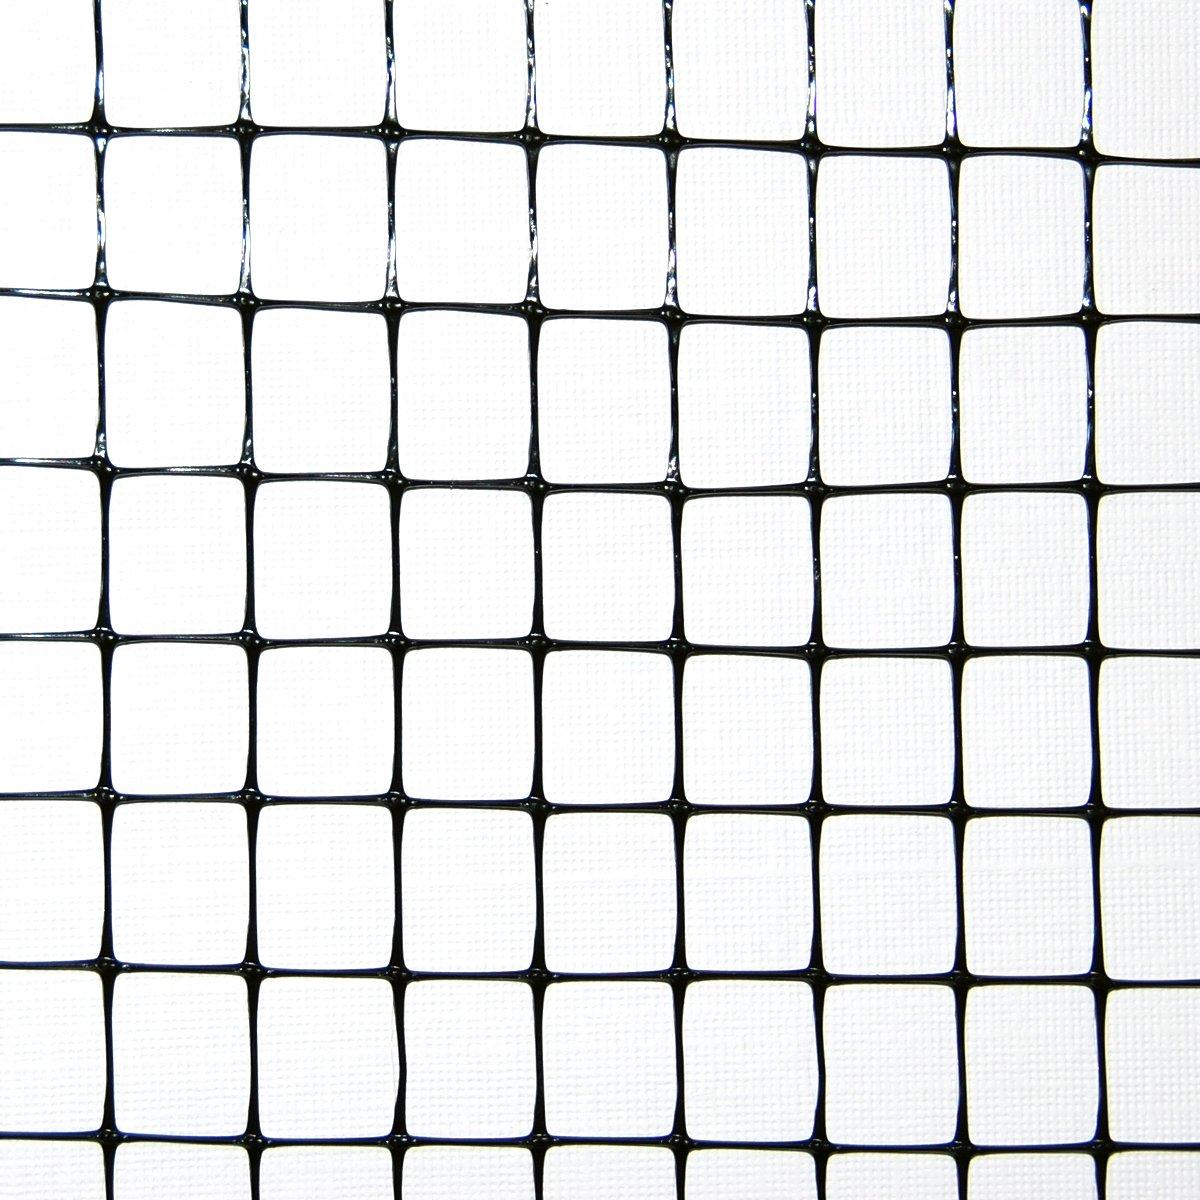 "Industrial Netting OV1581-168x100 Heavy Duty Polypropylene Bird Garden Net, 1/2"" Mesh, 100' Length x 14' Width, Black"